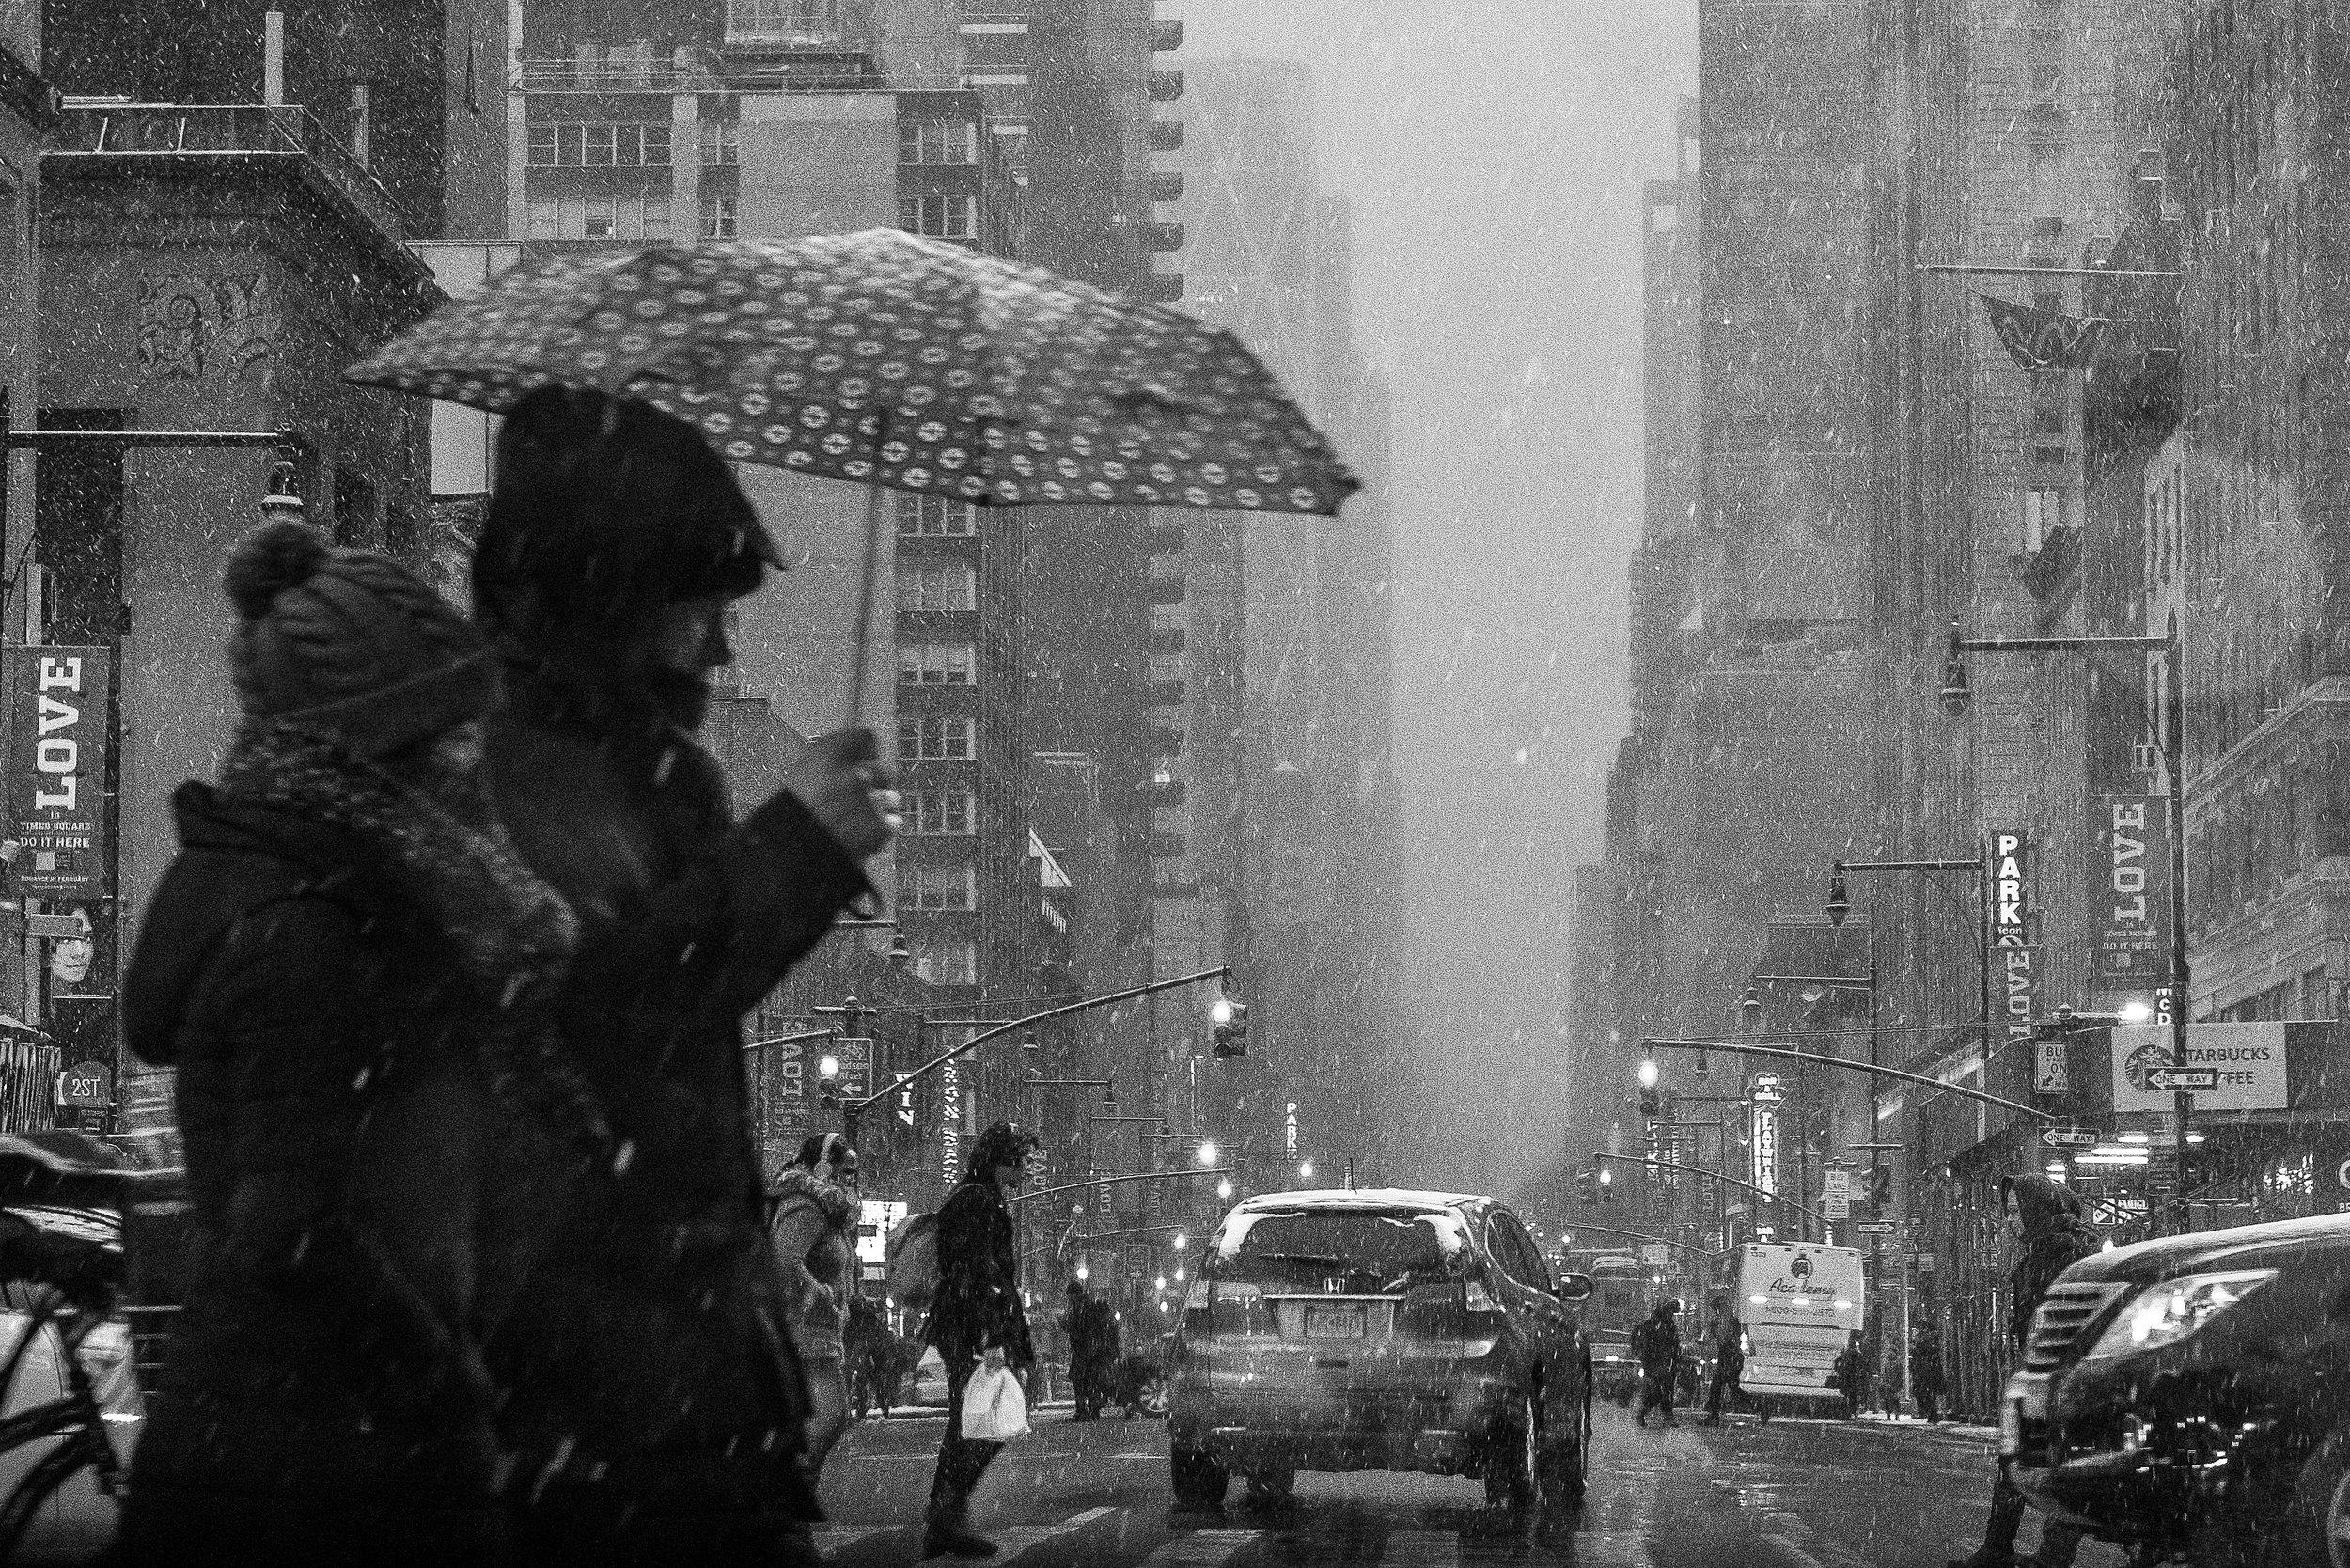 LOVE ON 8TH AVENUE, New York City